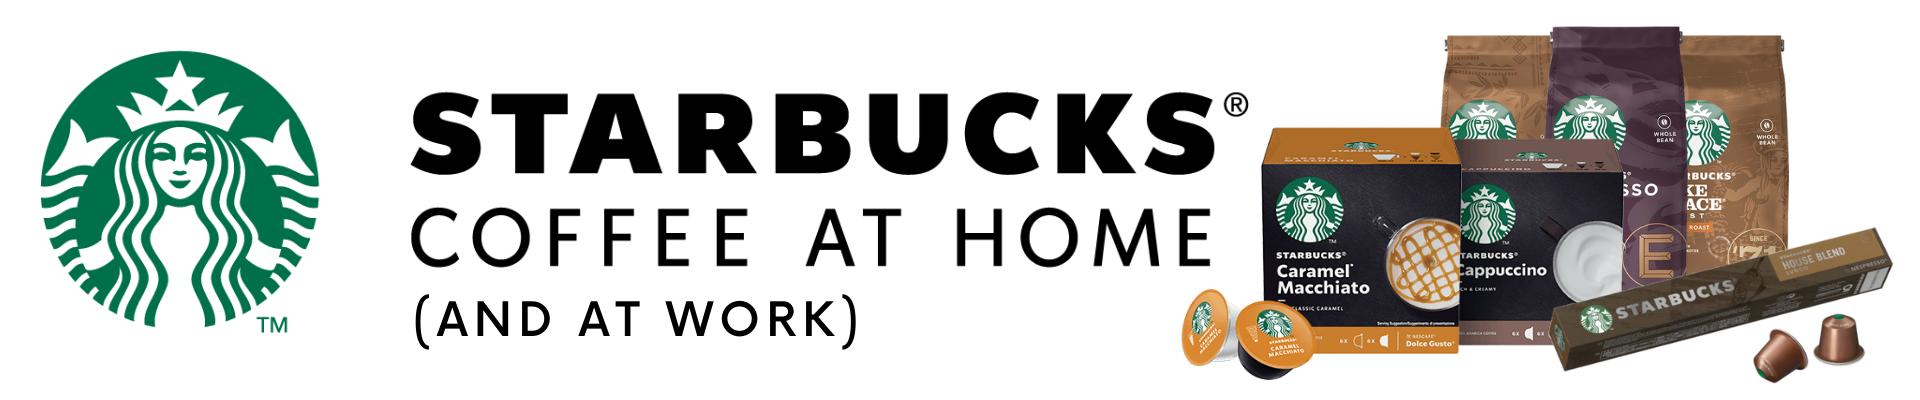 Starbucks at Home (and at work)